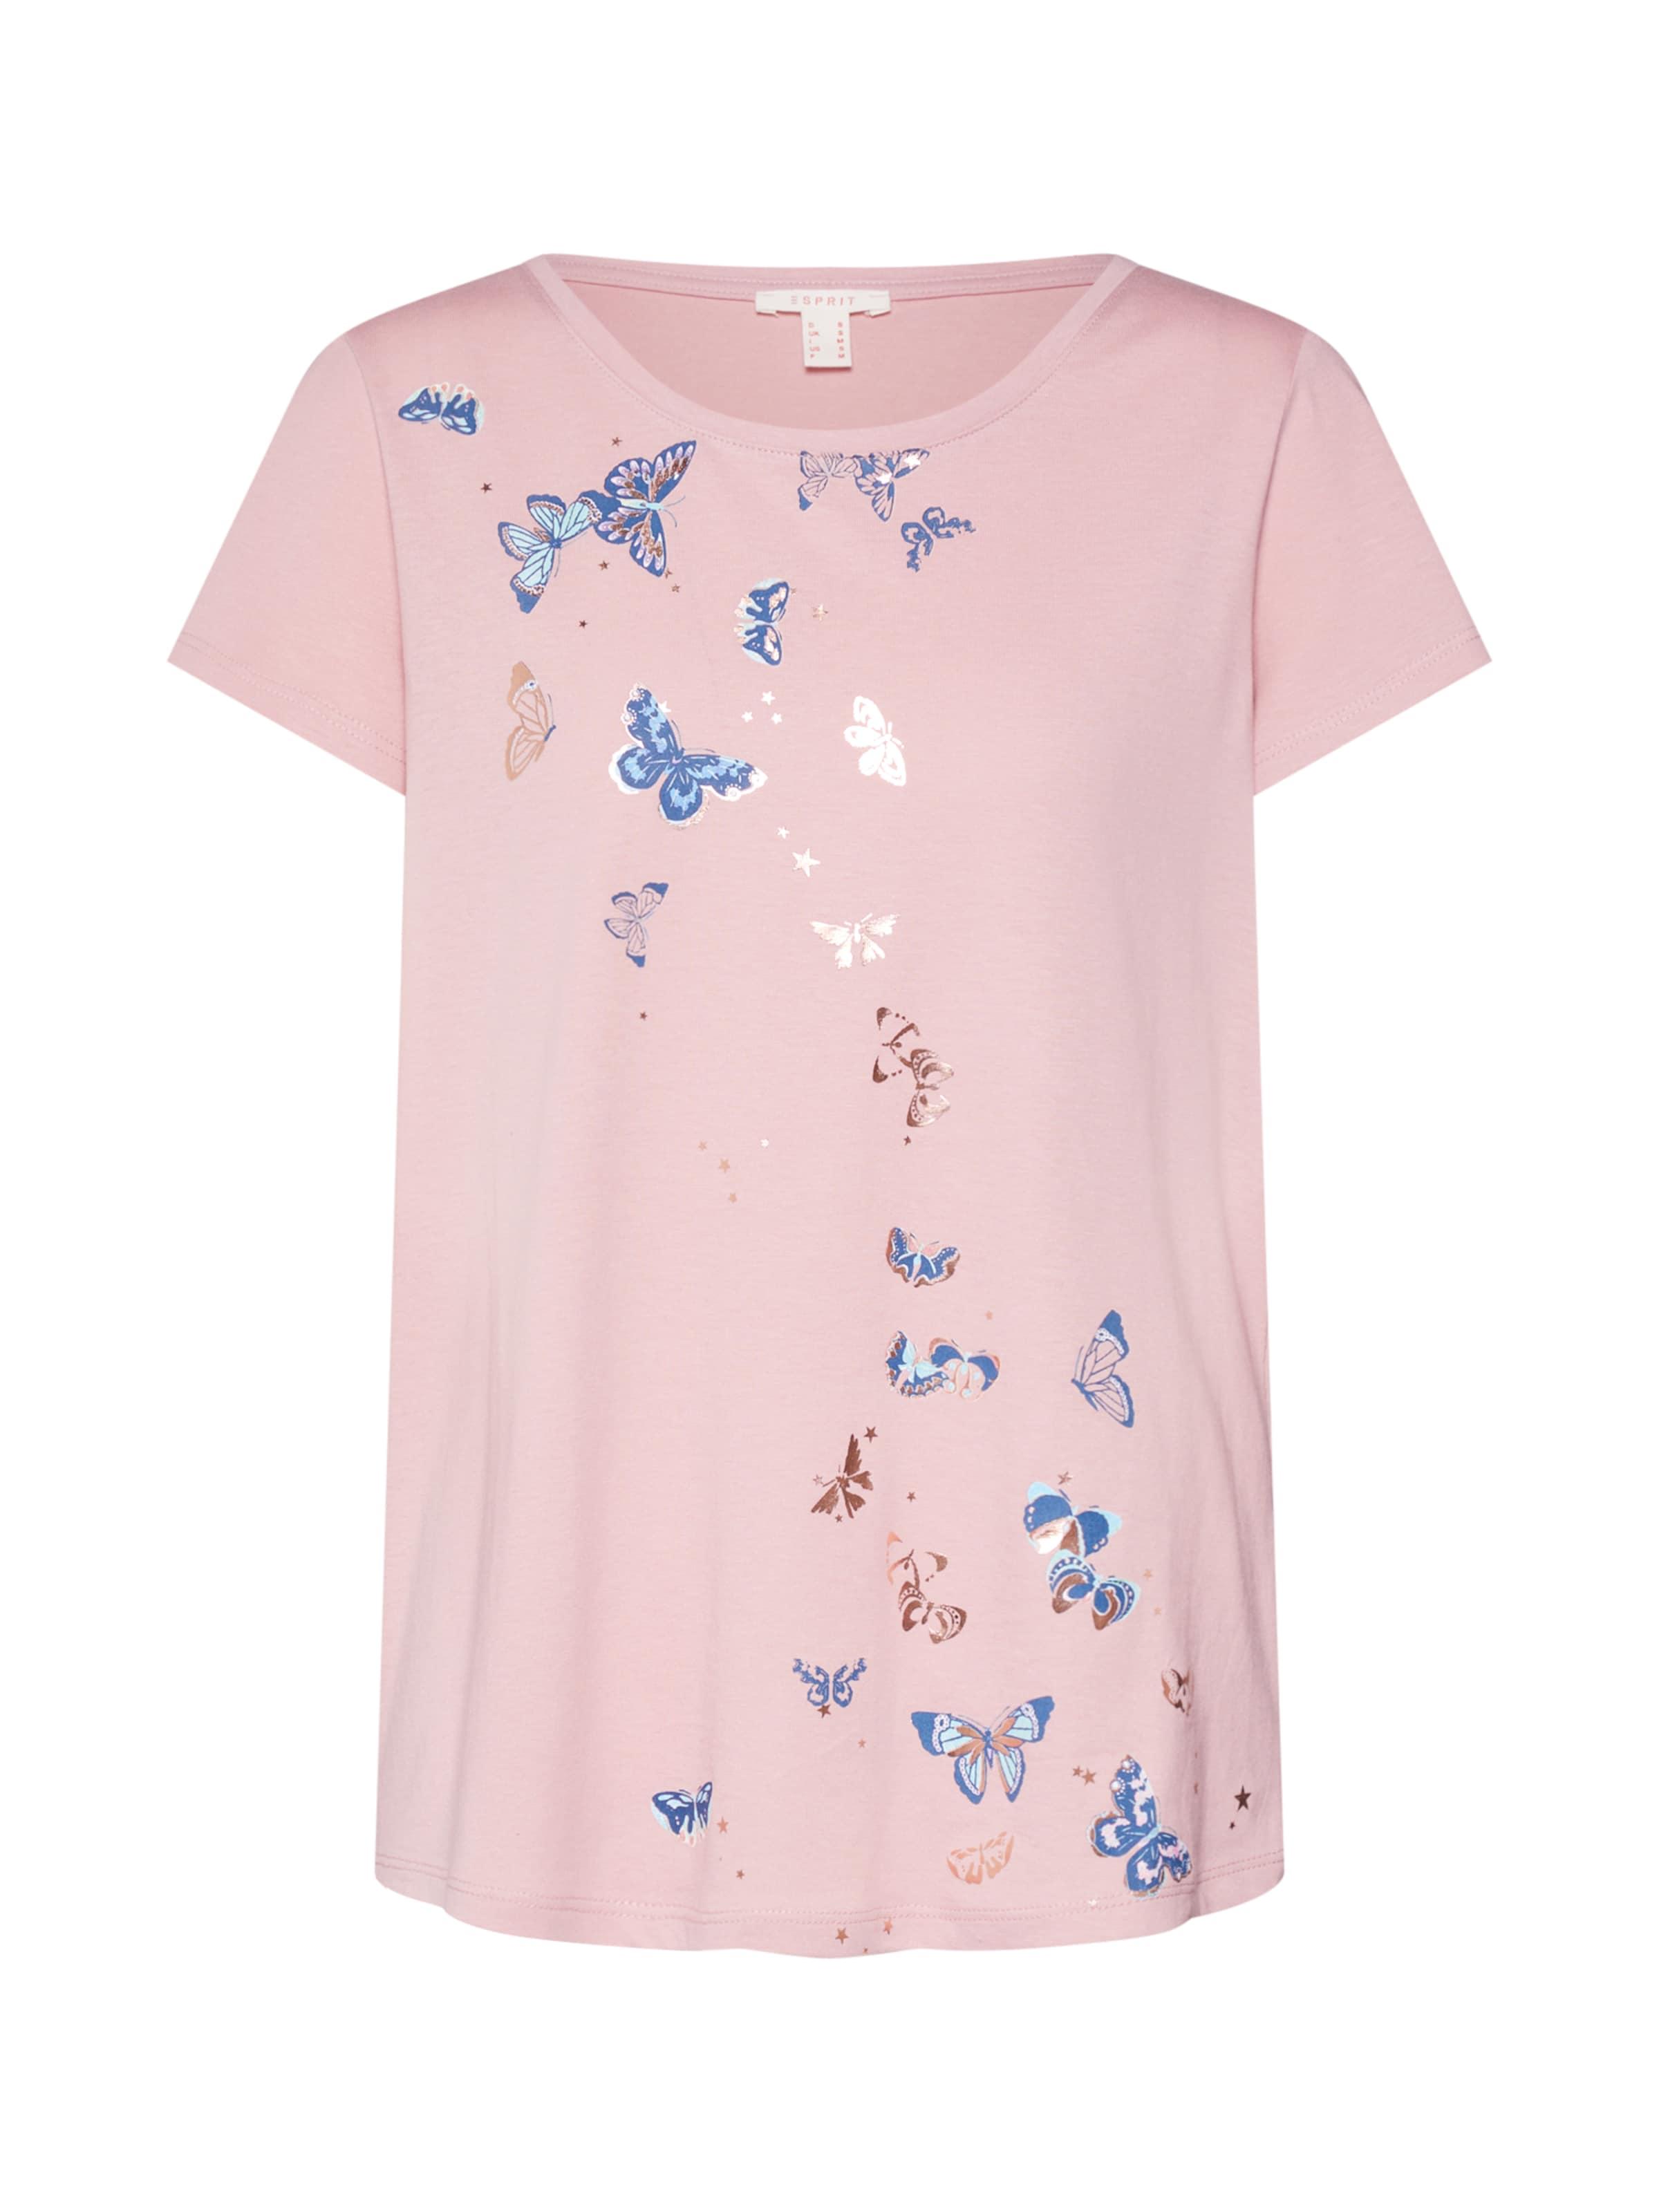 'whs Esprit shirt En Style' T Marine Bleu Aw 6vY7ybgf